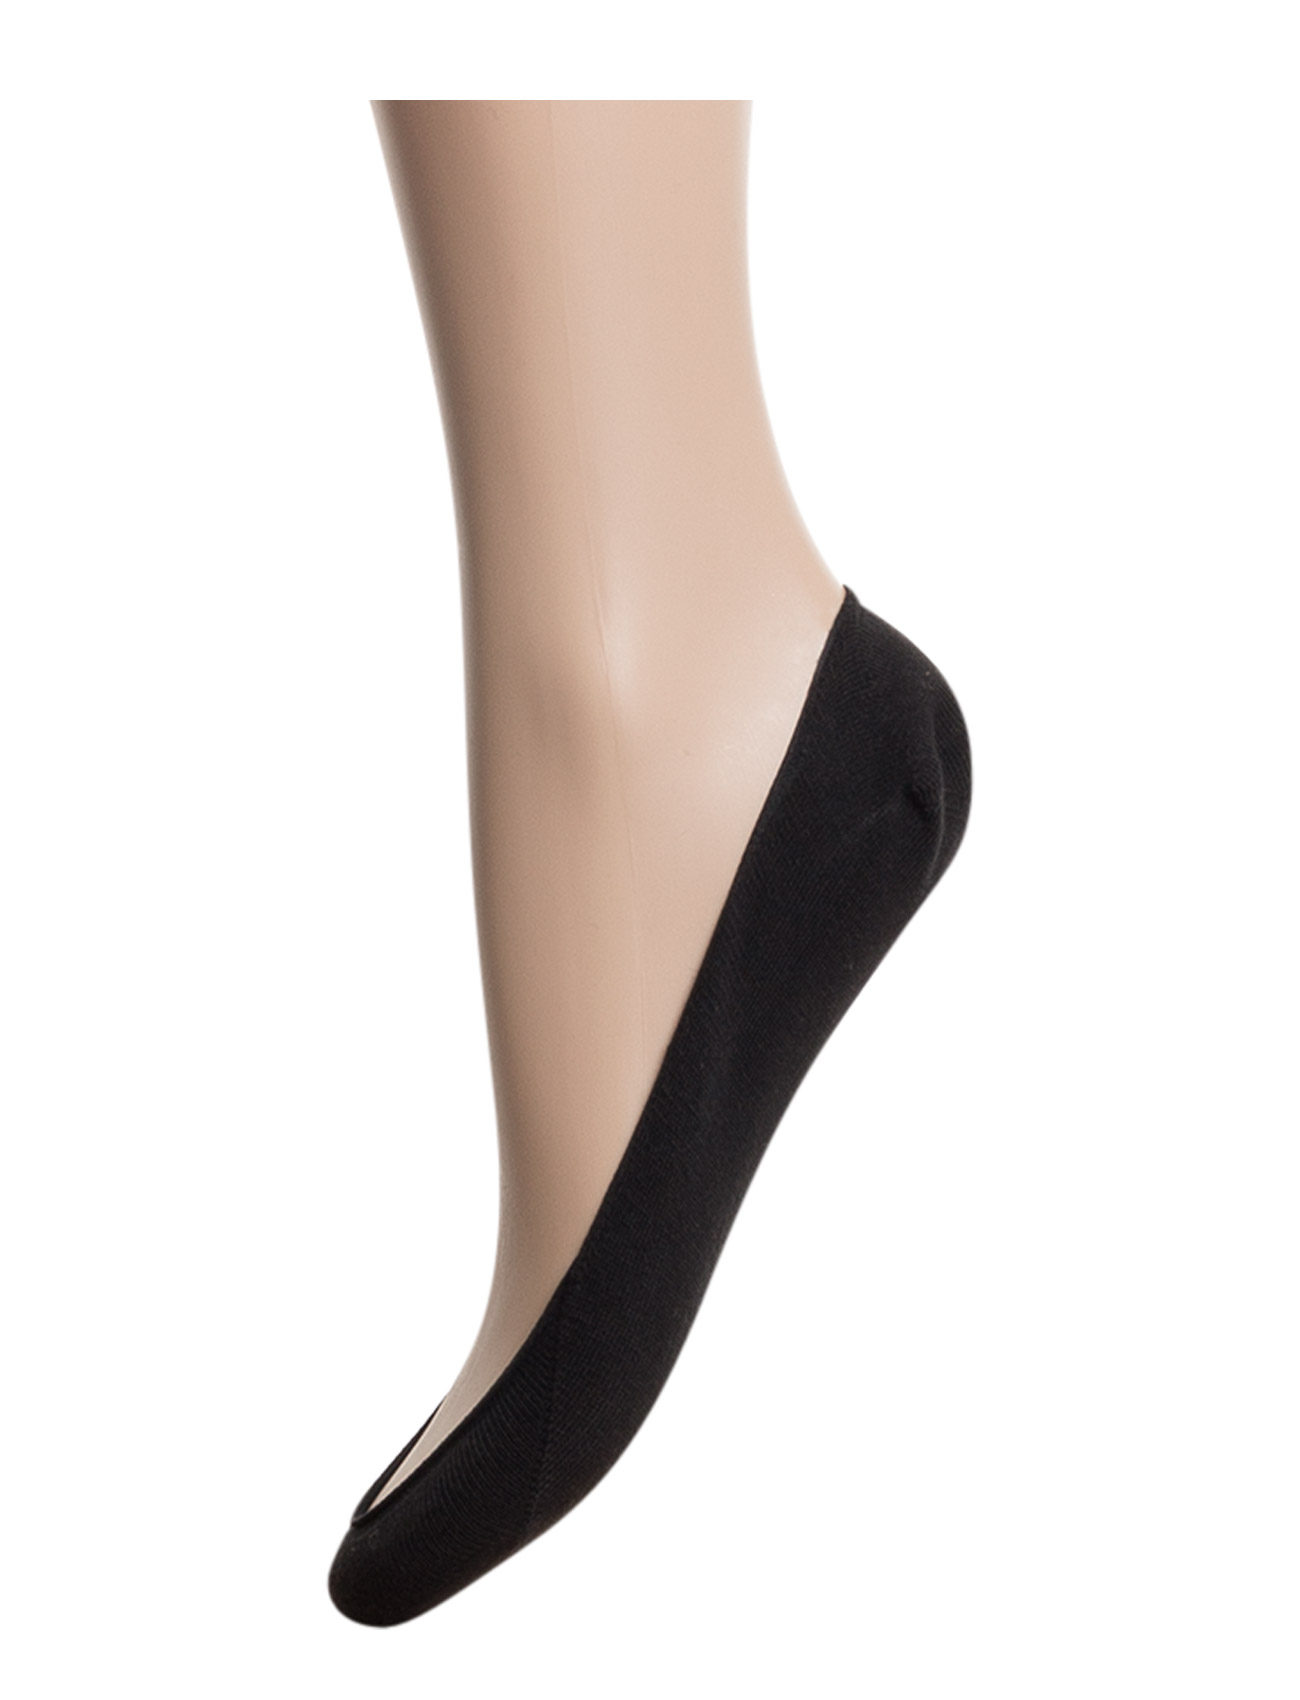 Only - Ballerina Hudson Strømpebukser til Damer i Sort